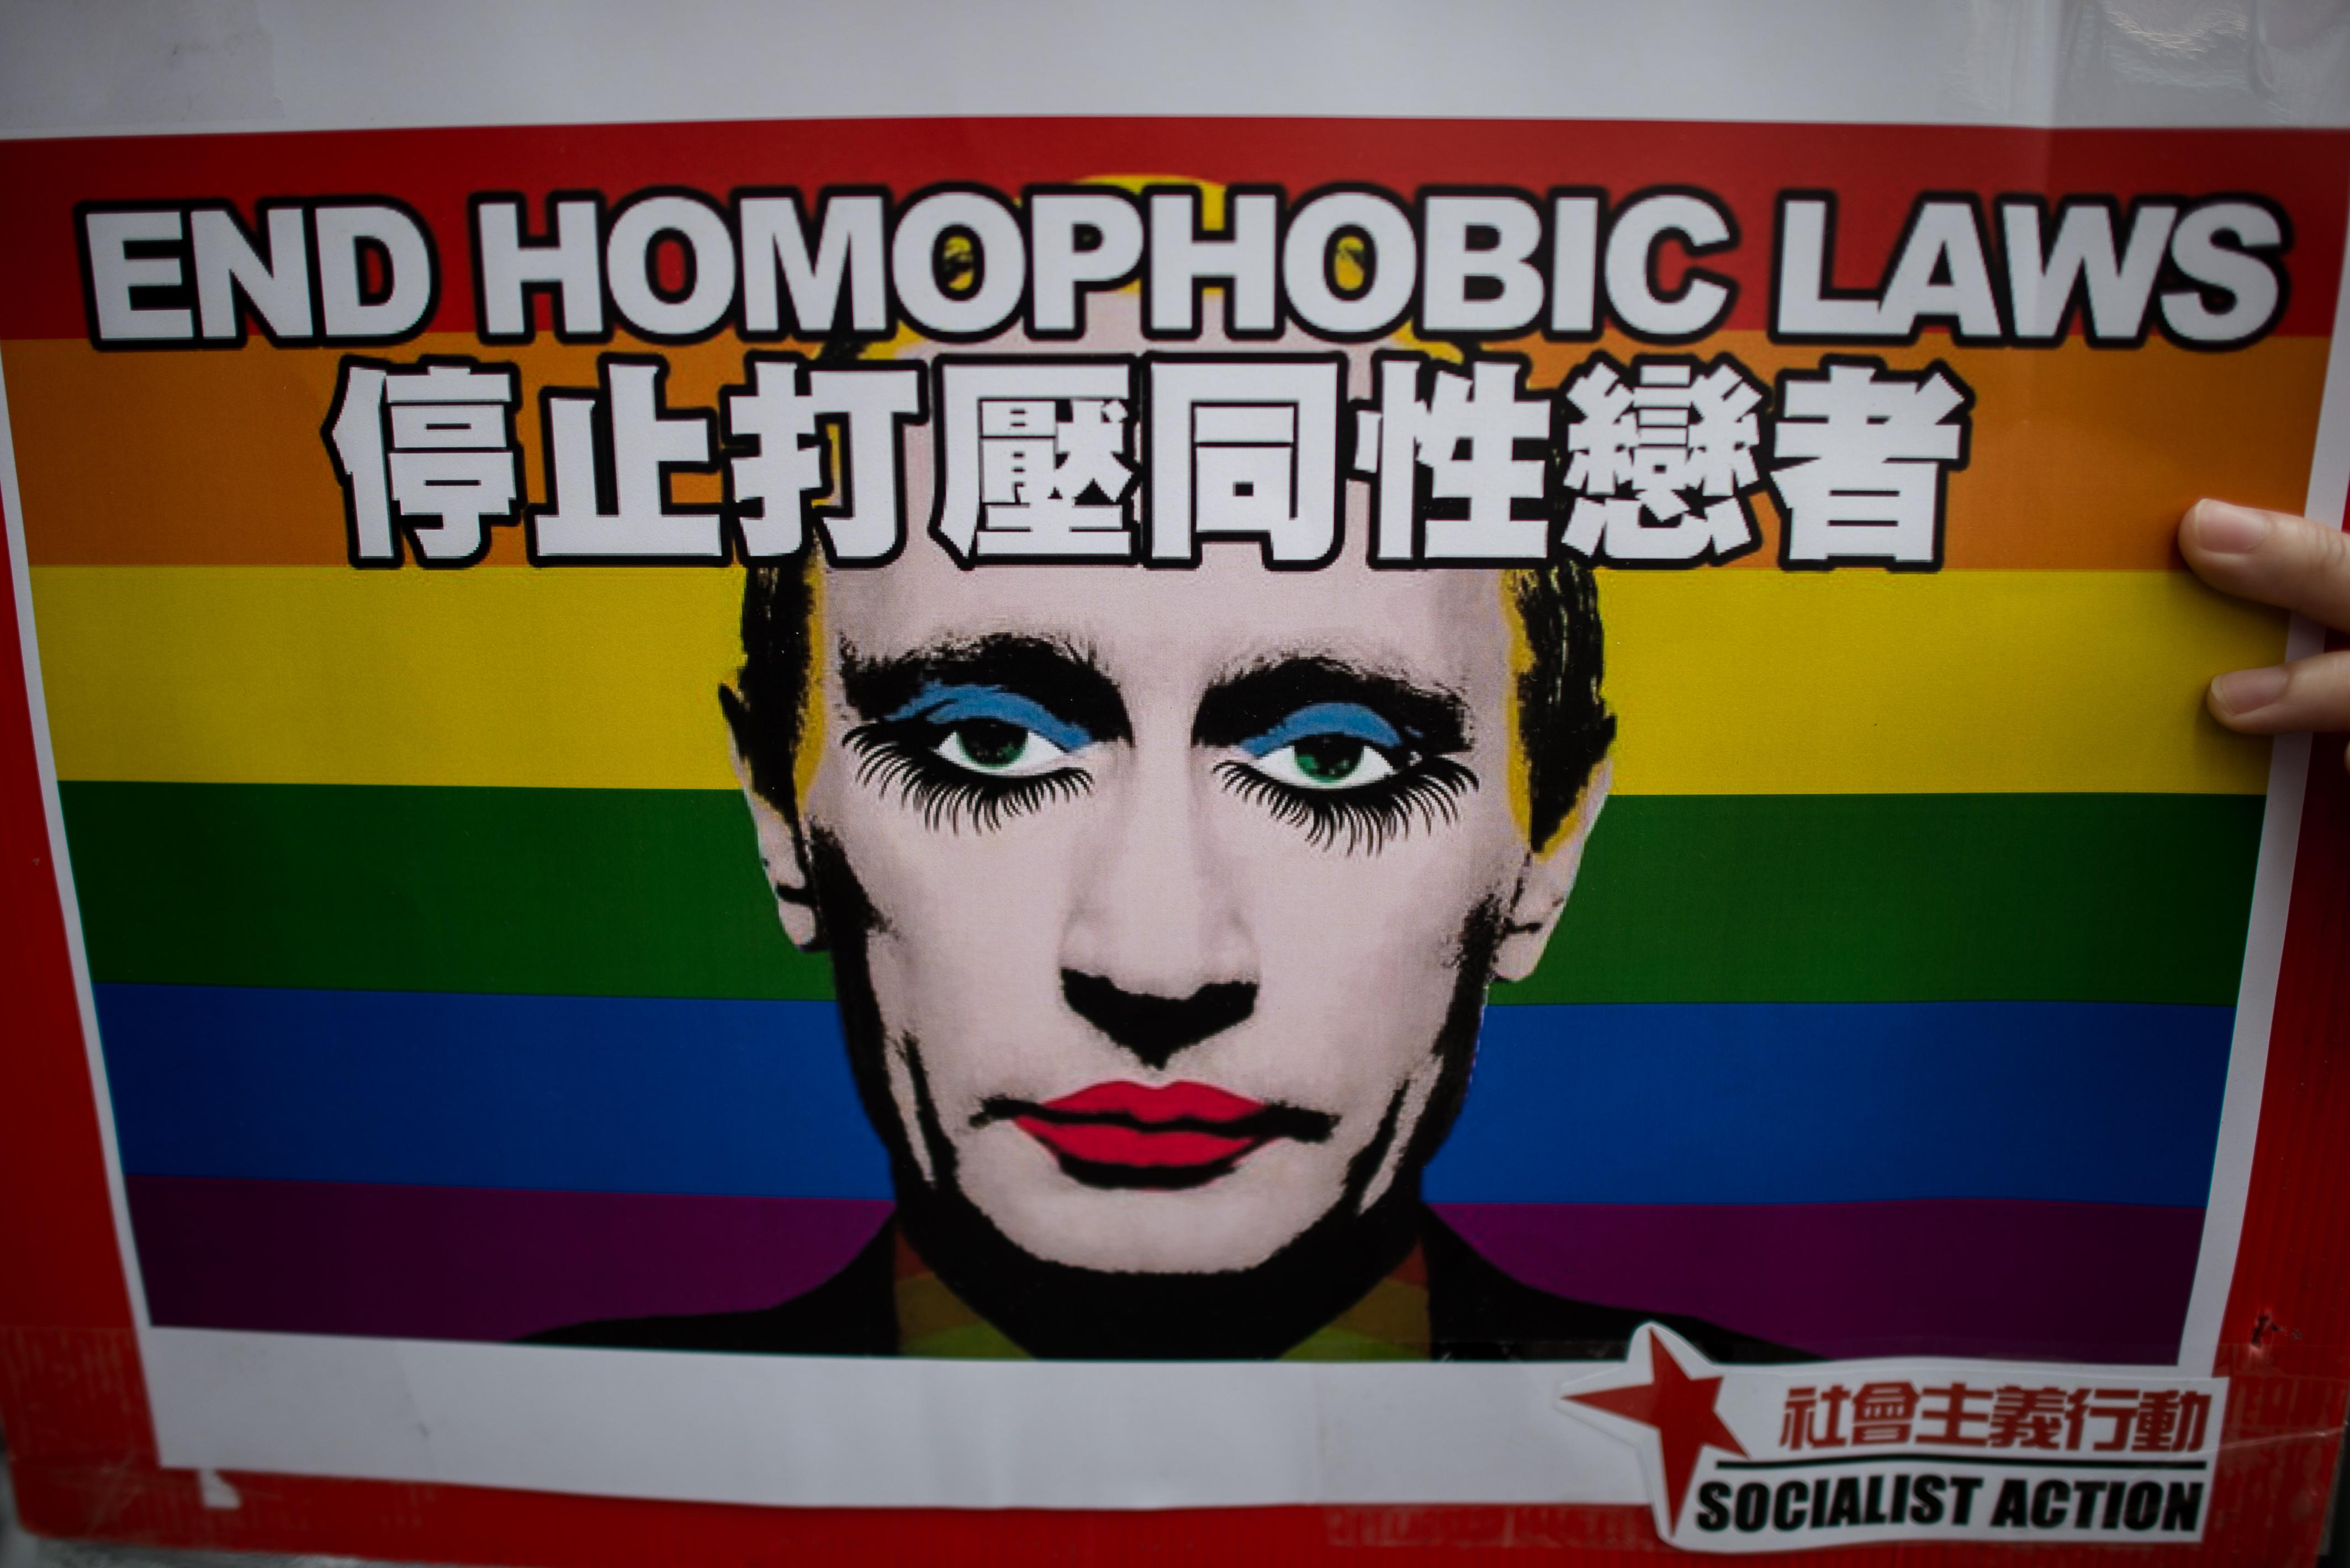 Homophobes have homosexual tendencies